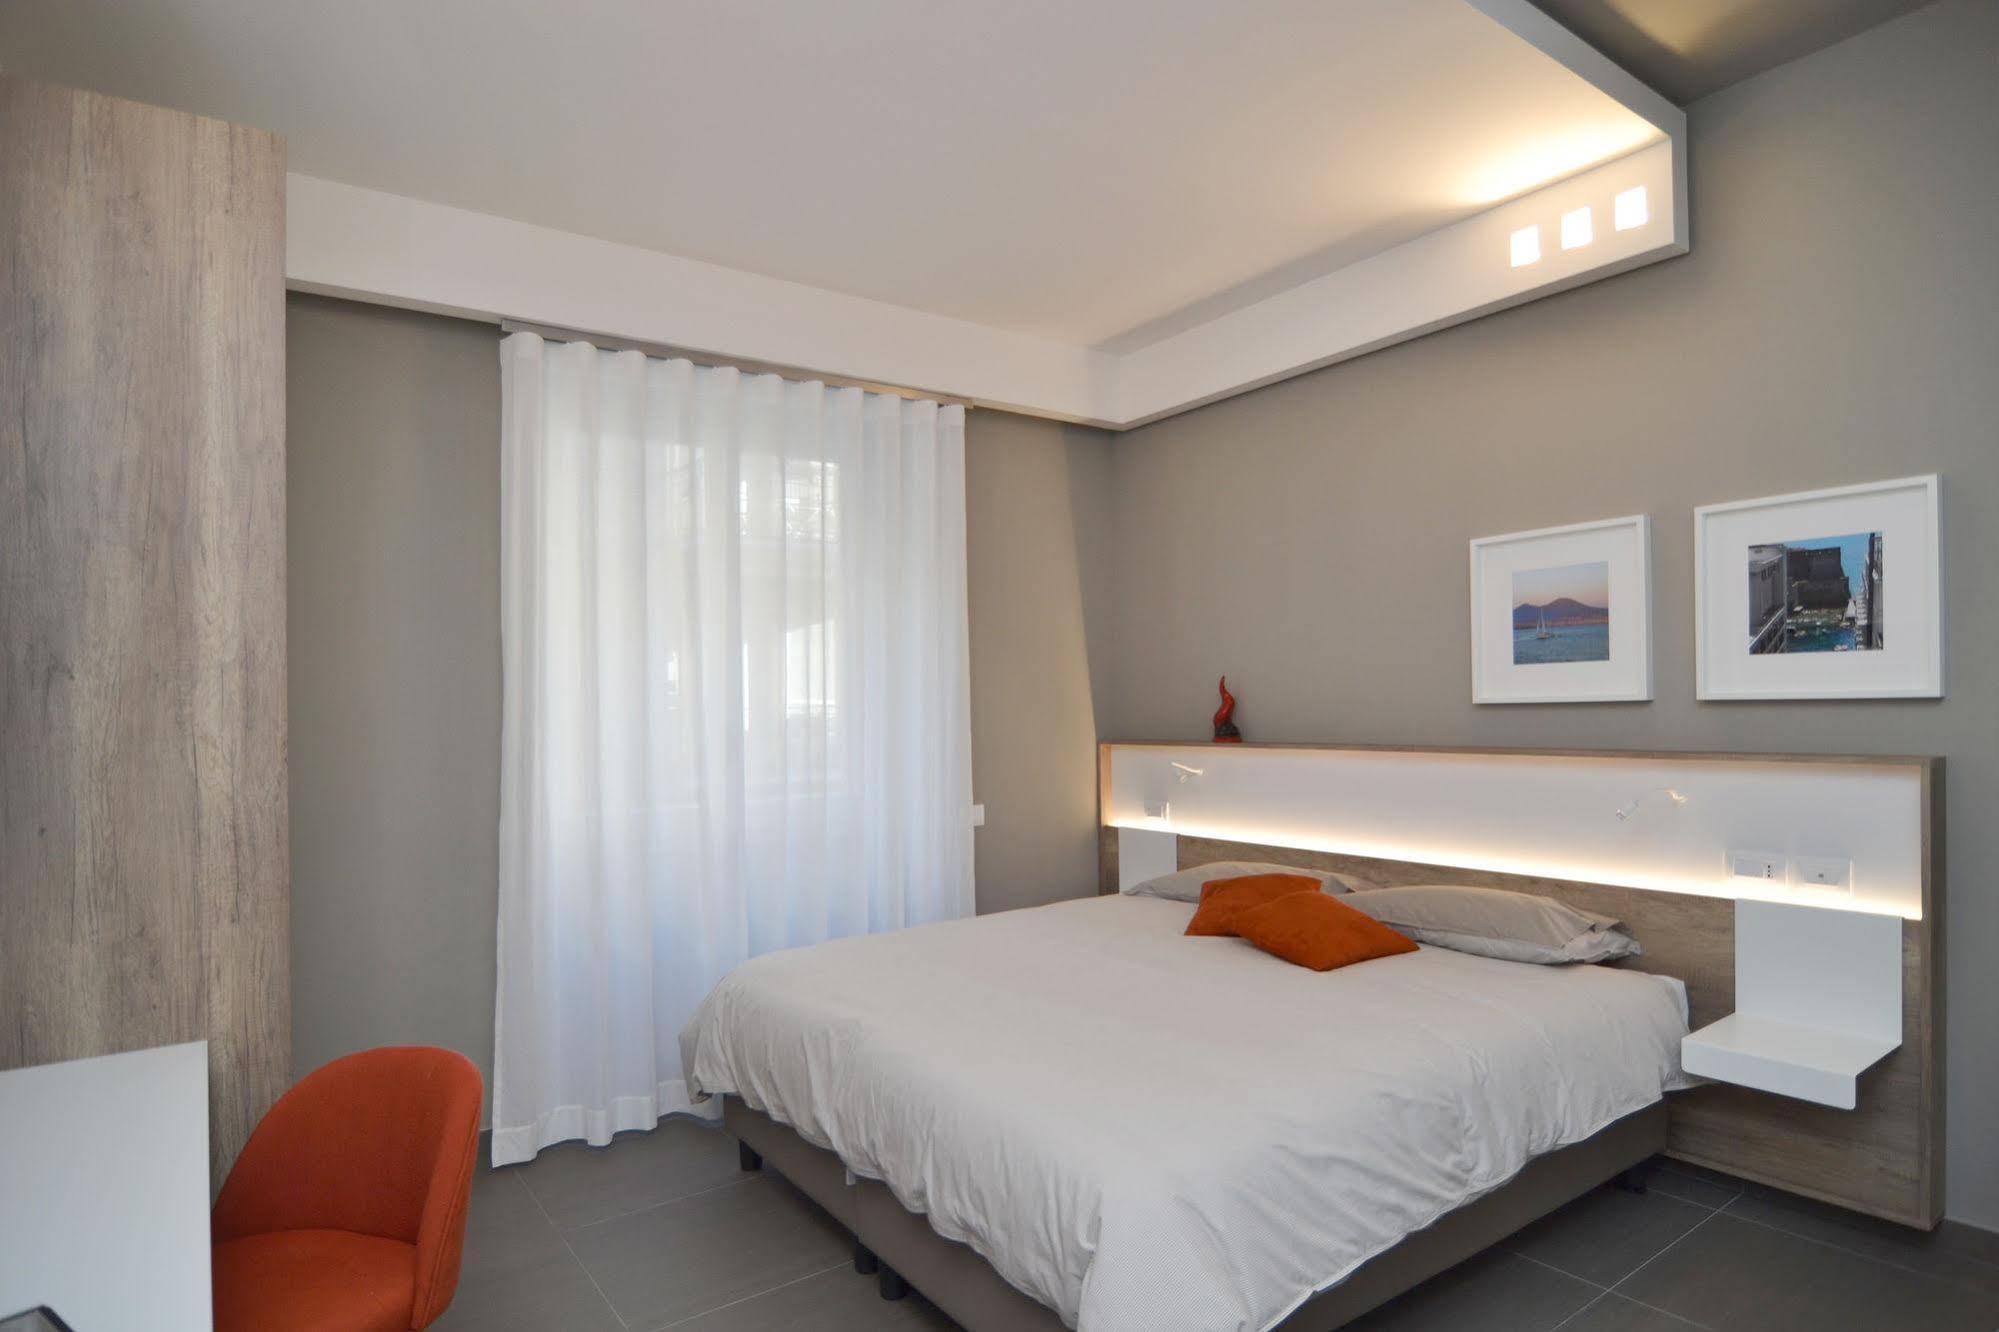 In Centro Bed & Breakfast